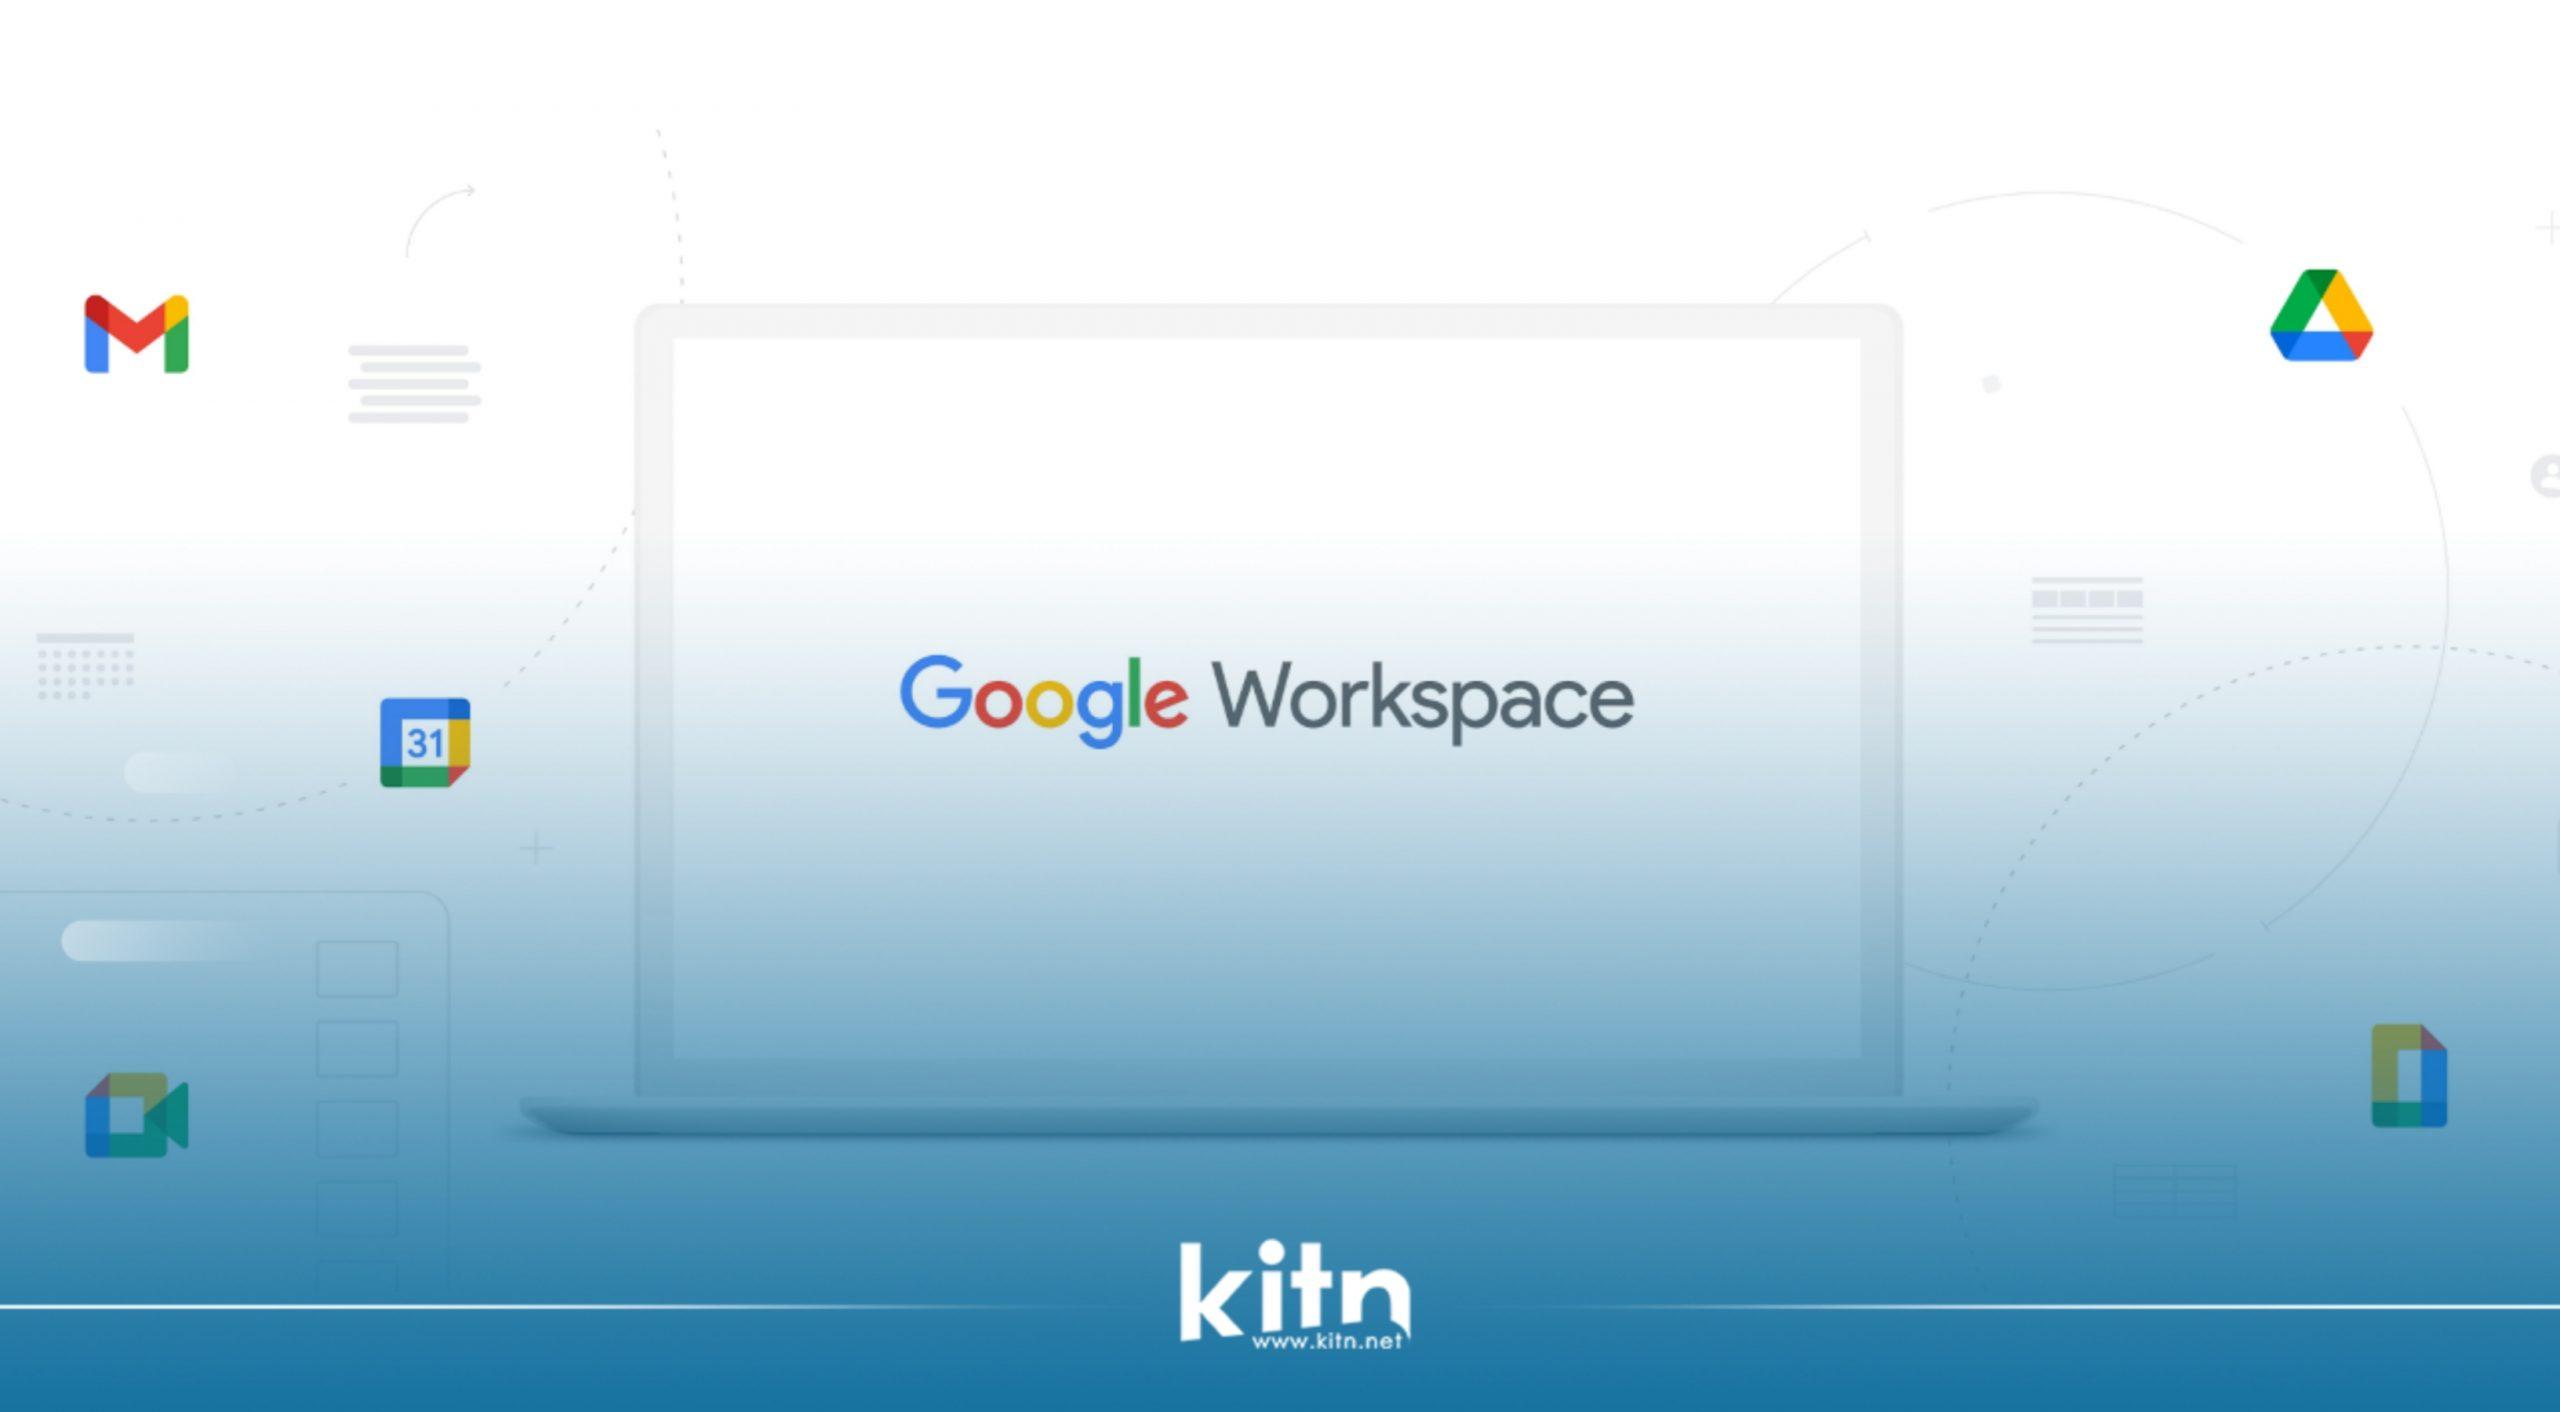 بە فەرمی گووگڵ ناوی کۆمەڵەی G Suite گۆڕی بە Google Workspace و هەندێک تایبەتمەندی نوێی بۆ کۆمەڵەکە ڕاگەیاند